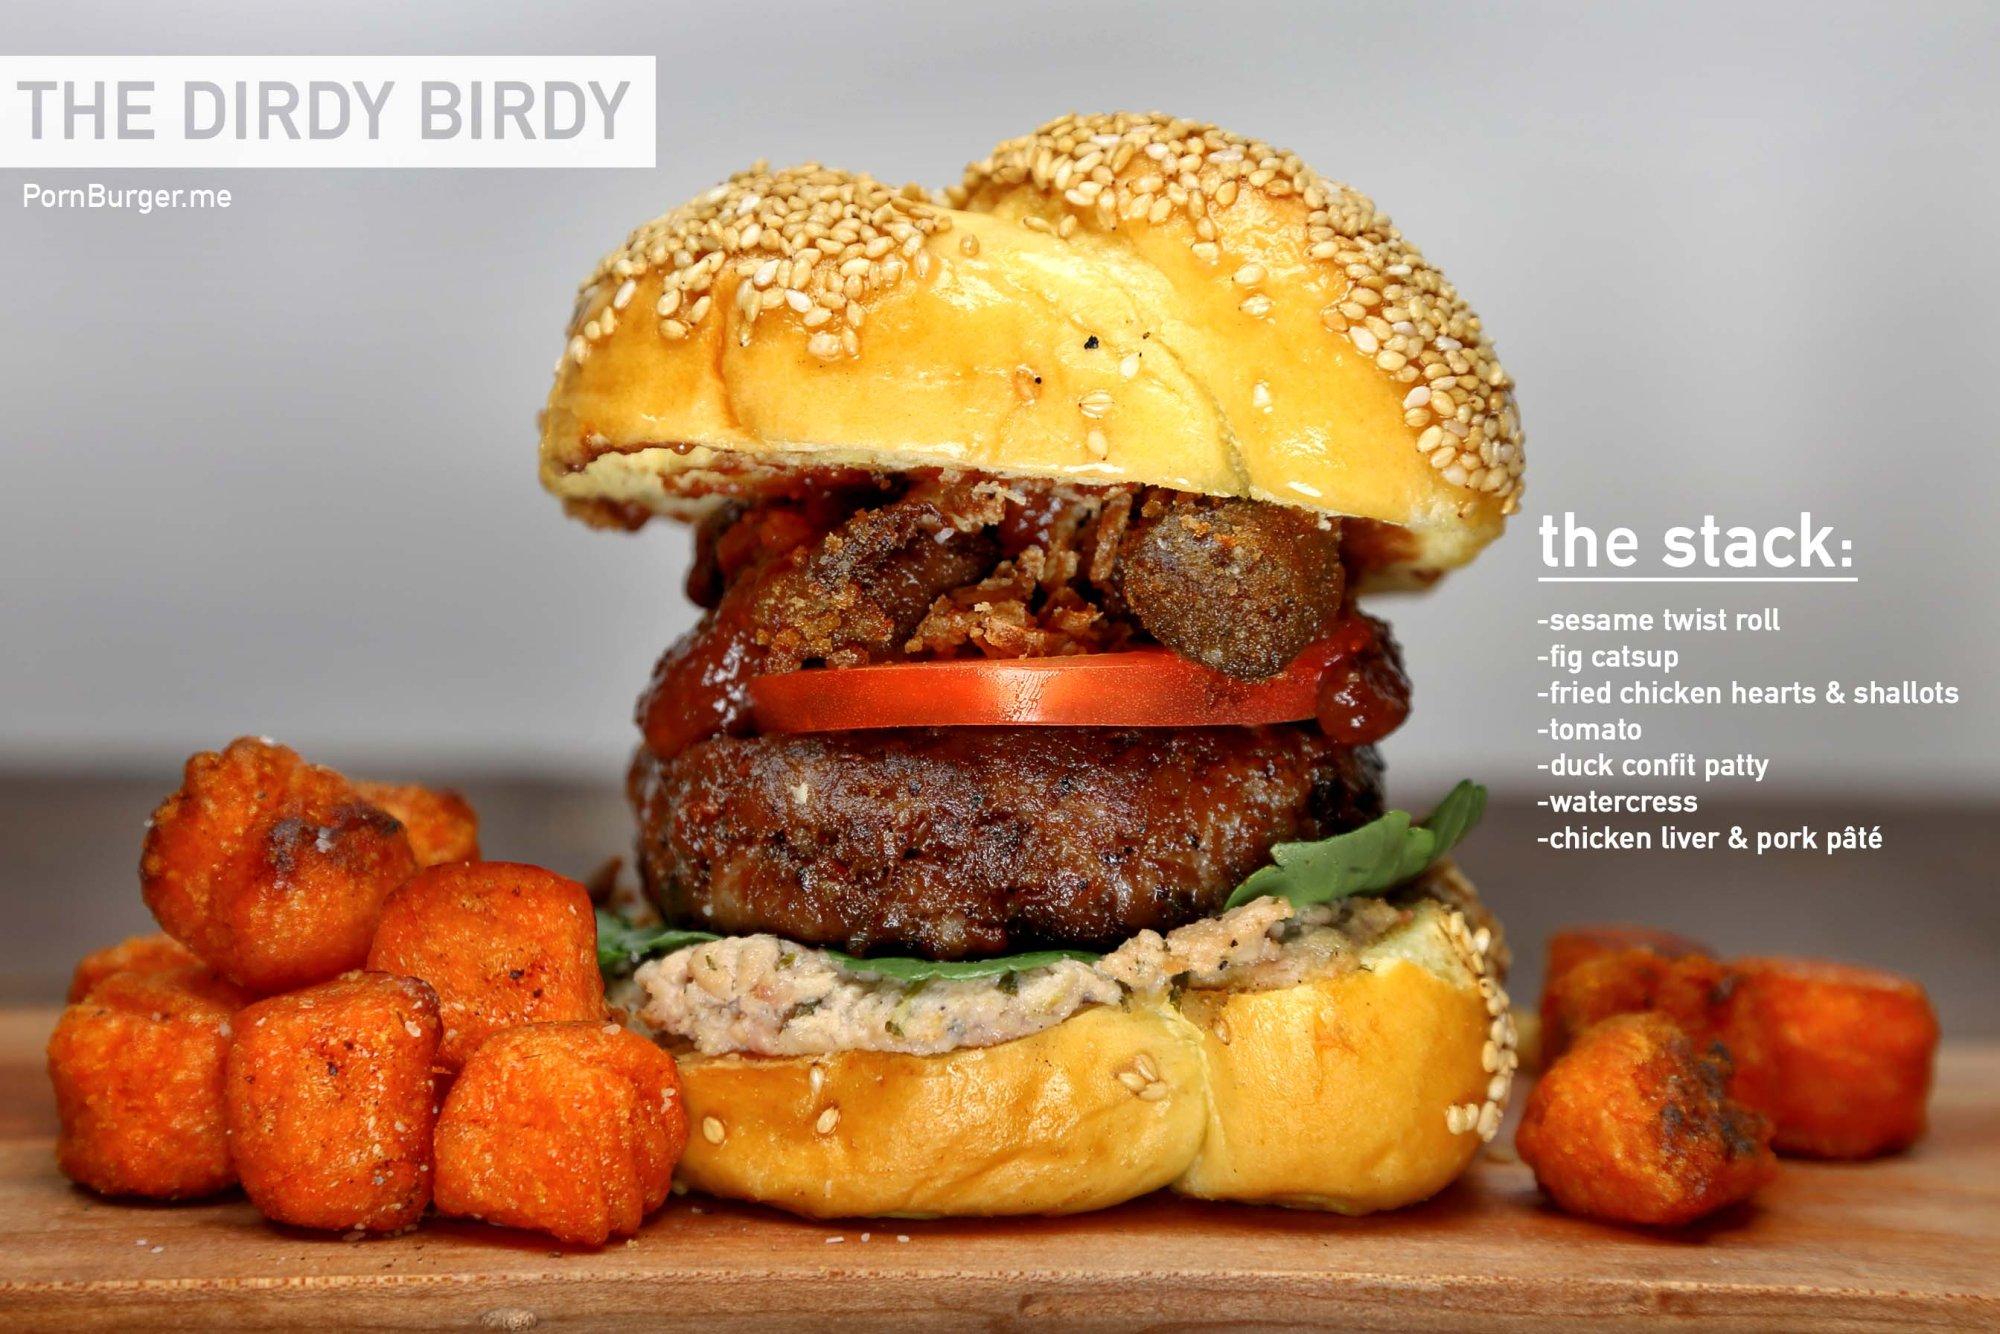 The Dirdy Birdy Burger